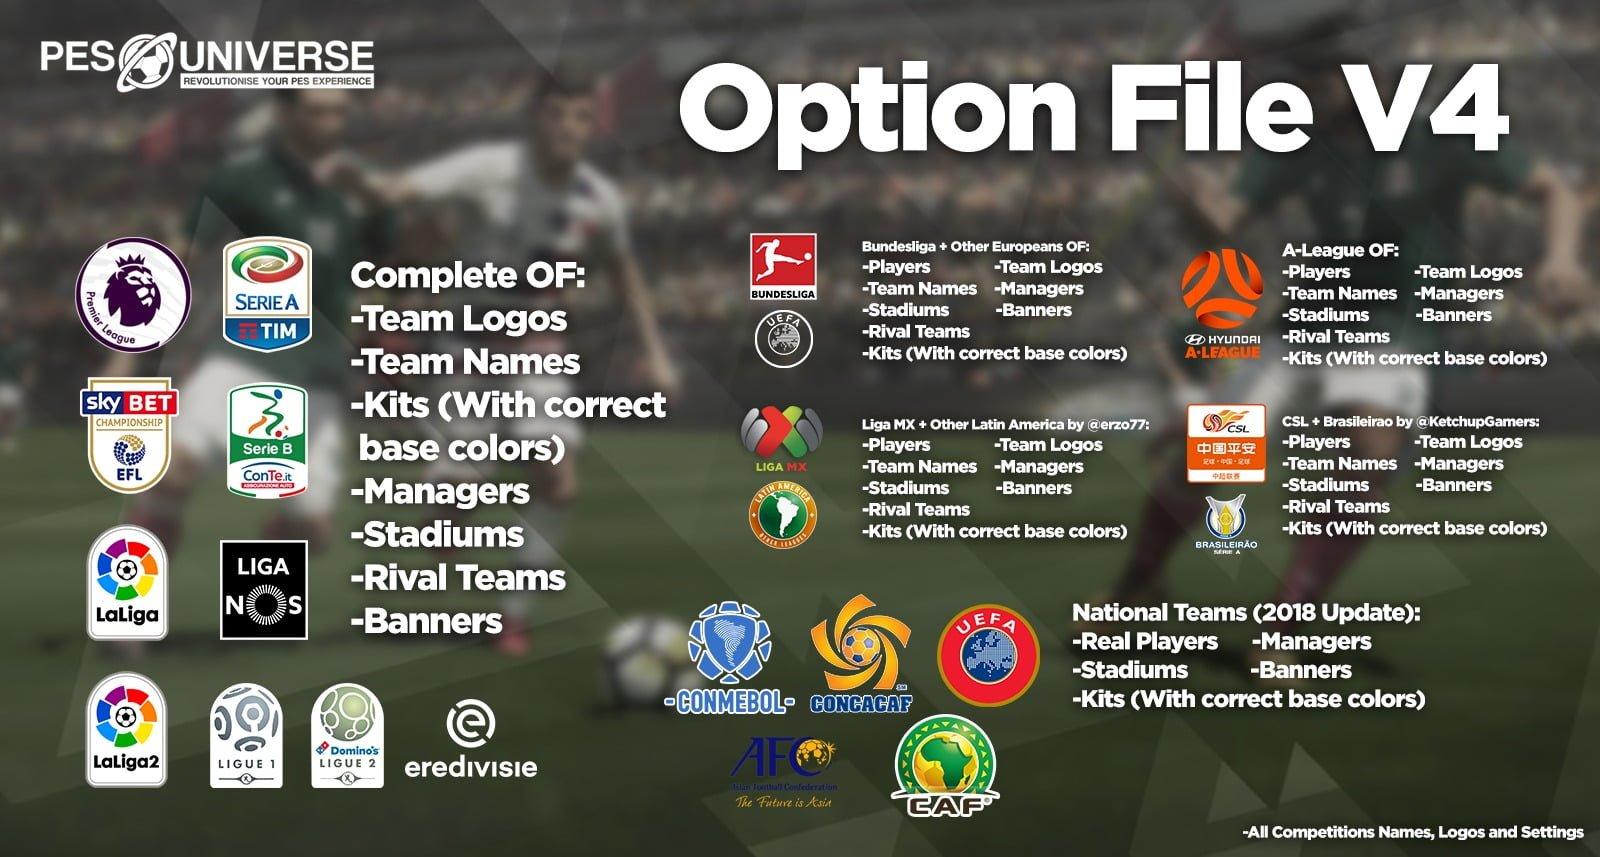 PES 2018 Patch PS4 (DLC 3 0)- Lizenzen, Bundesliga & Anleitung